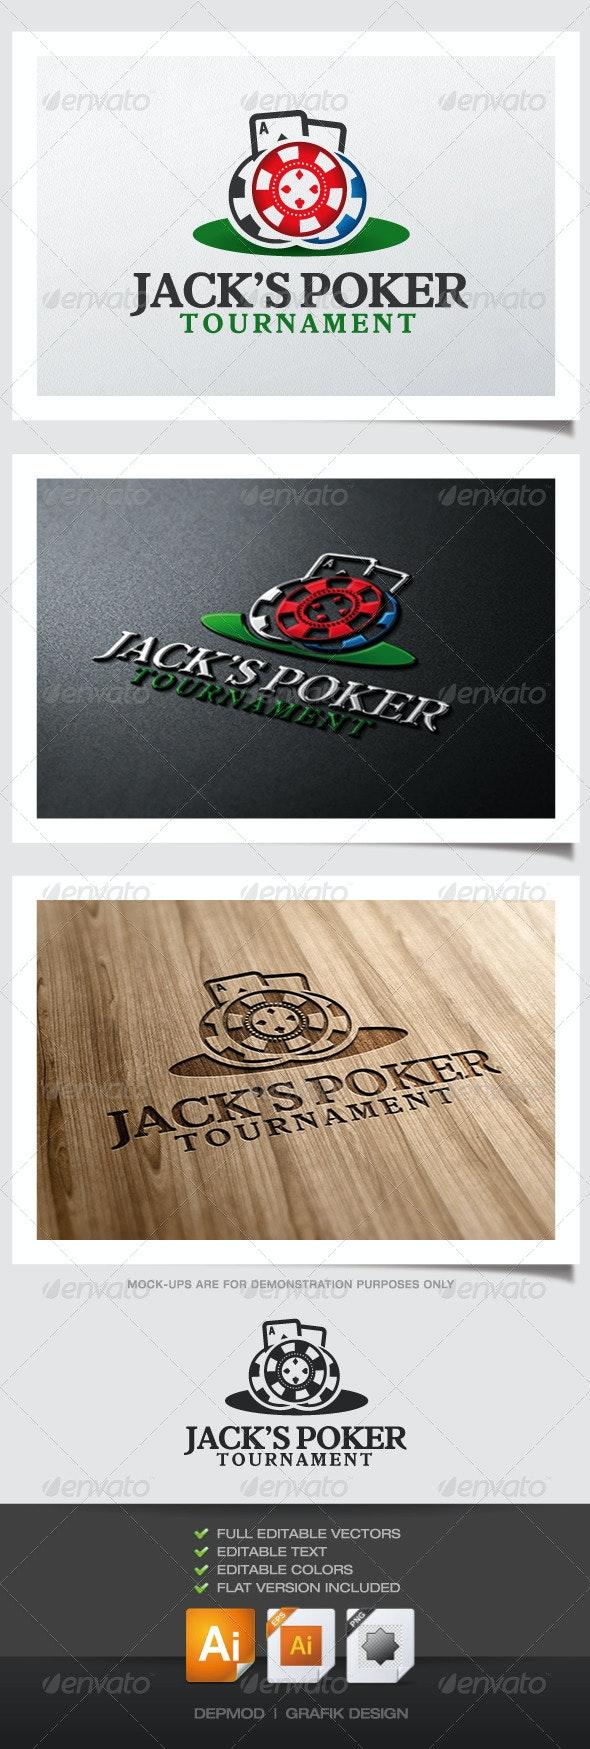 Jack's Poker Tournament